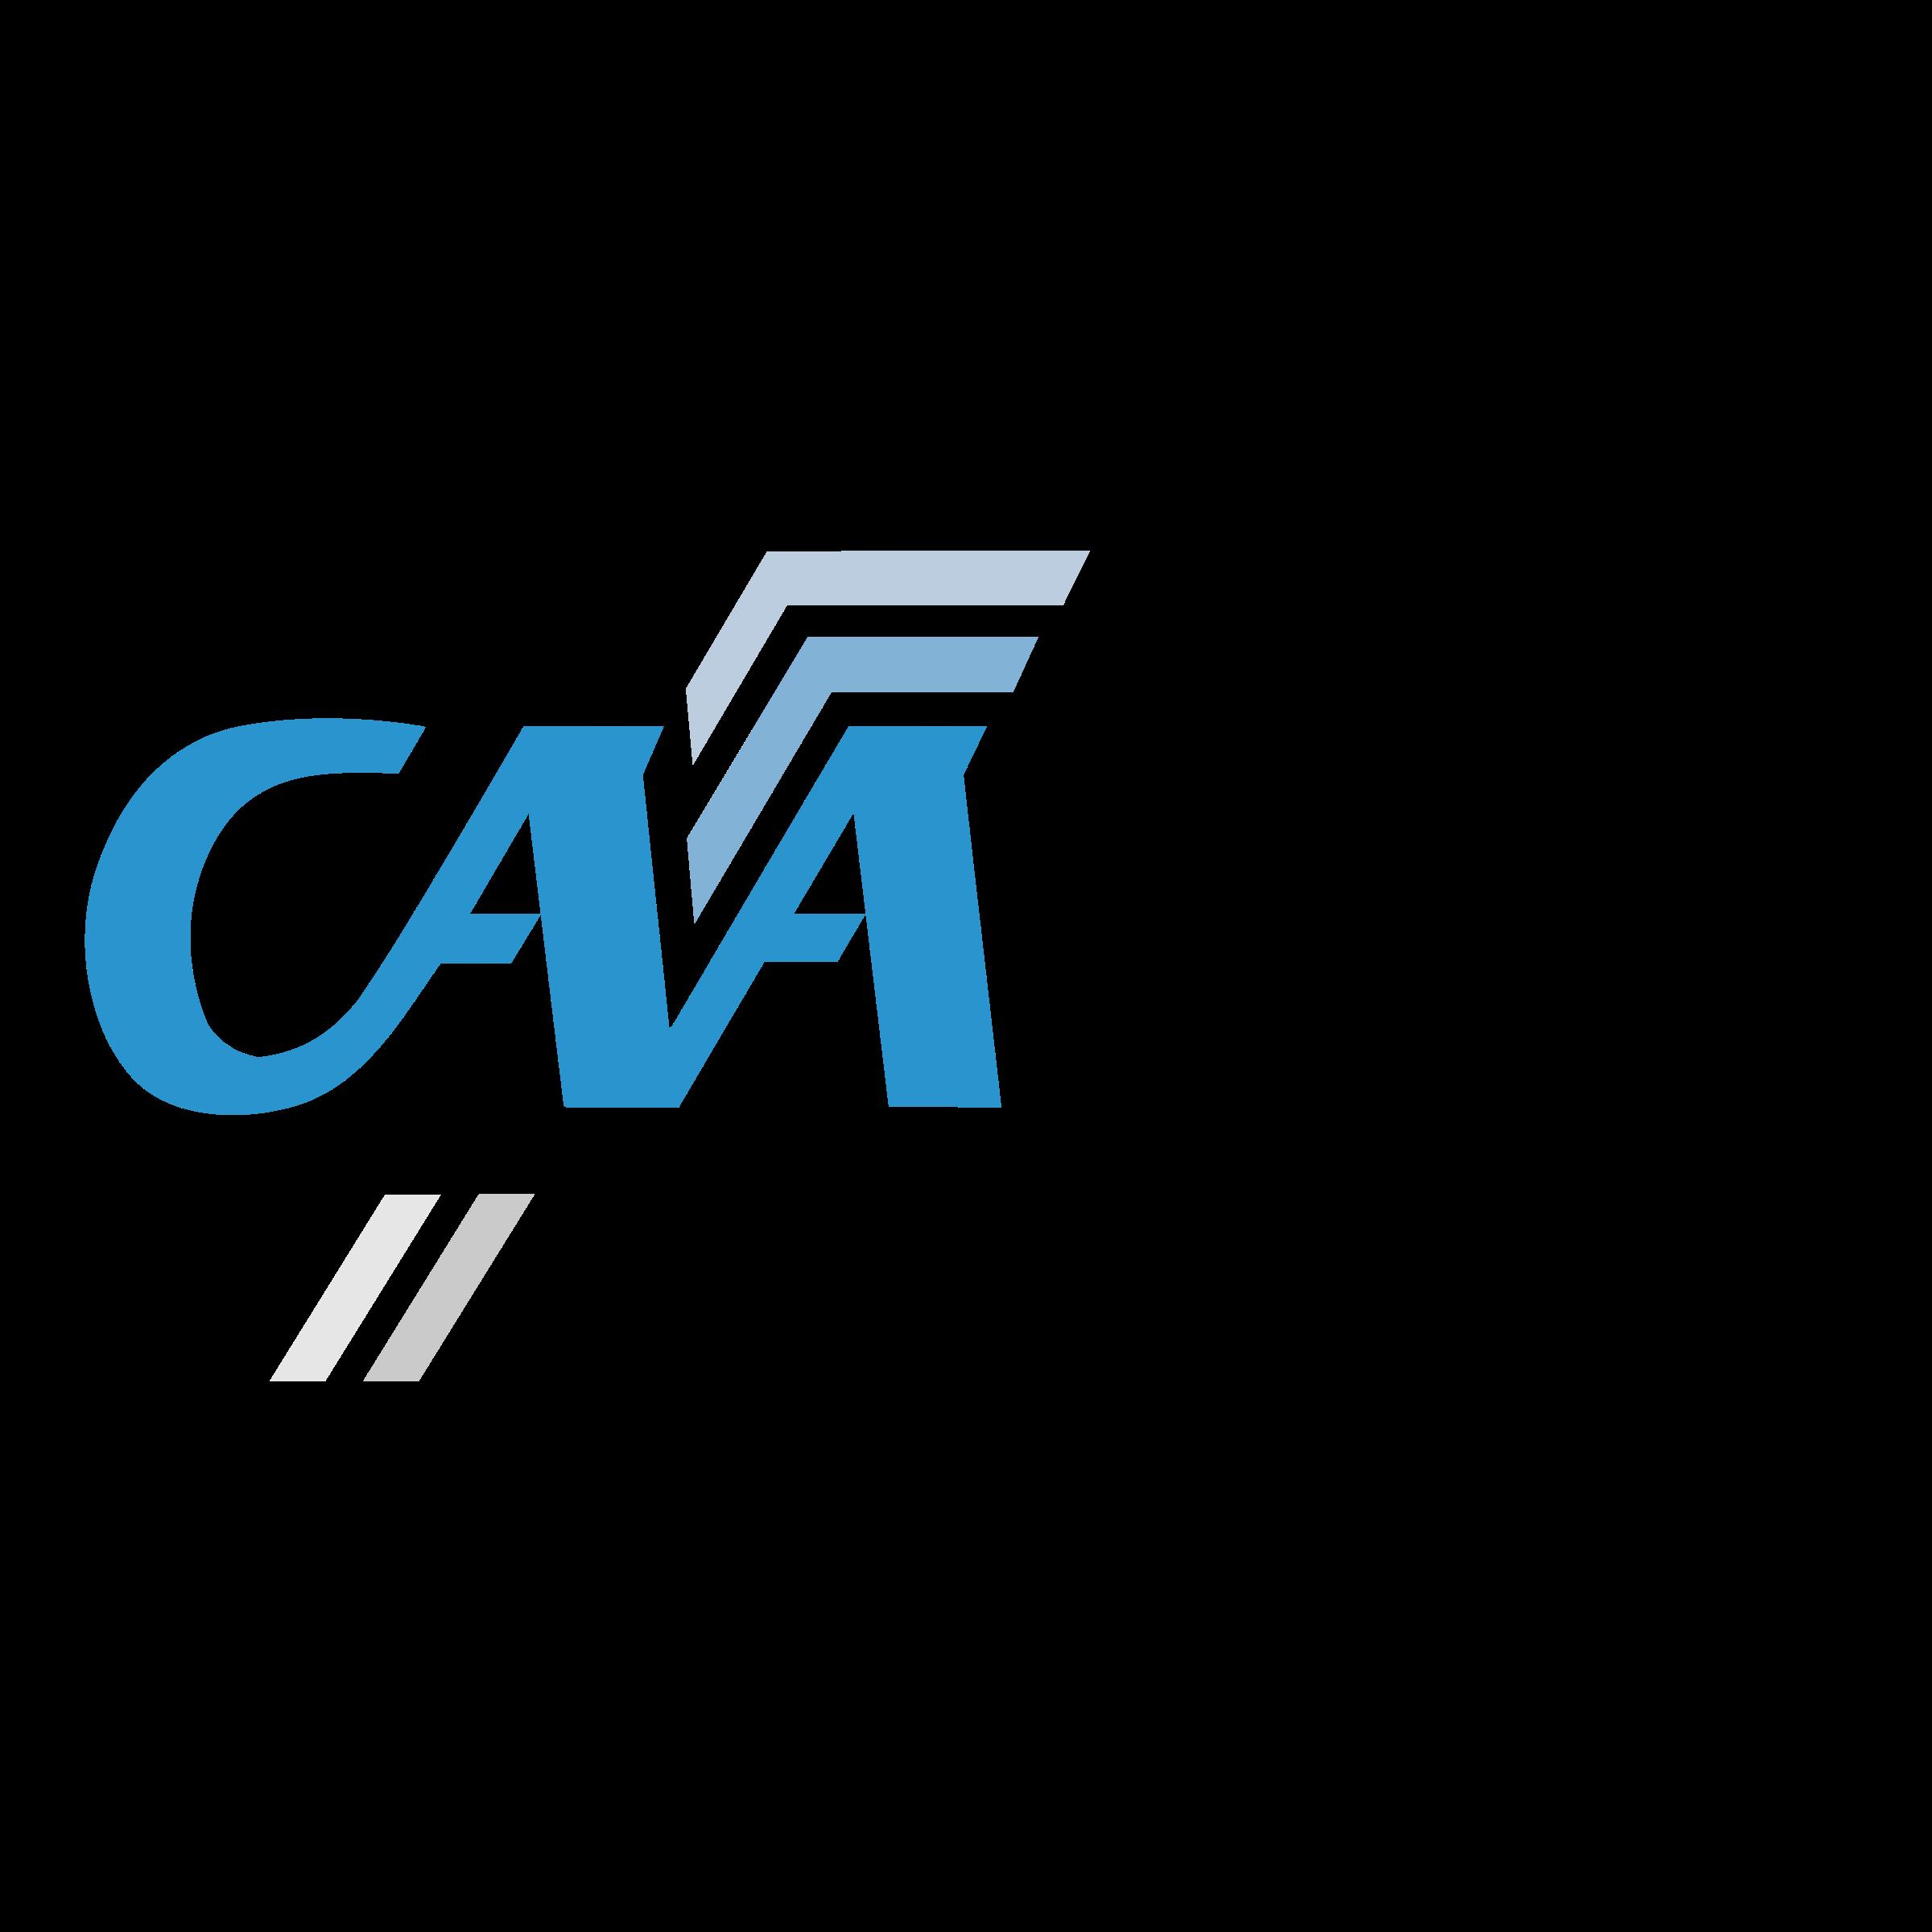 CAA Logo PNG Transparent & SVG Vector.